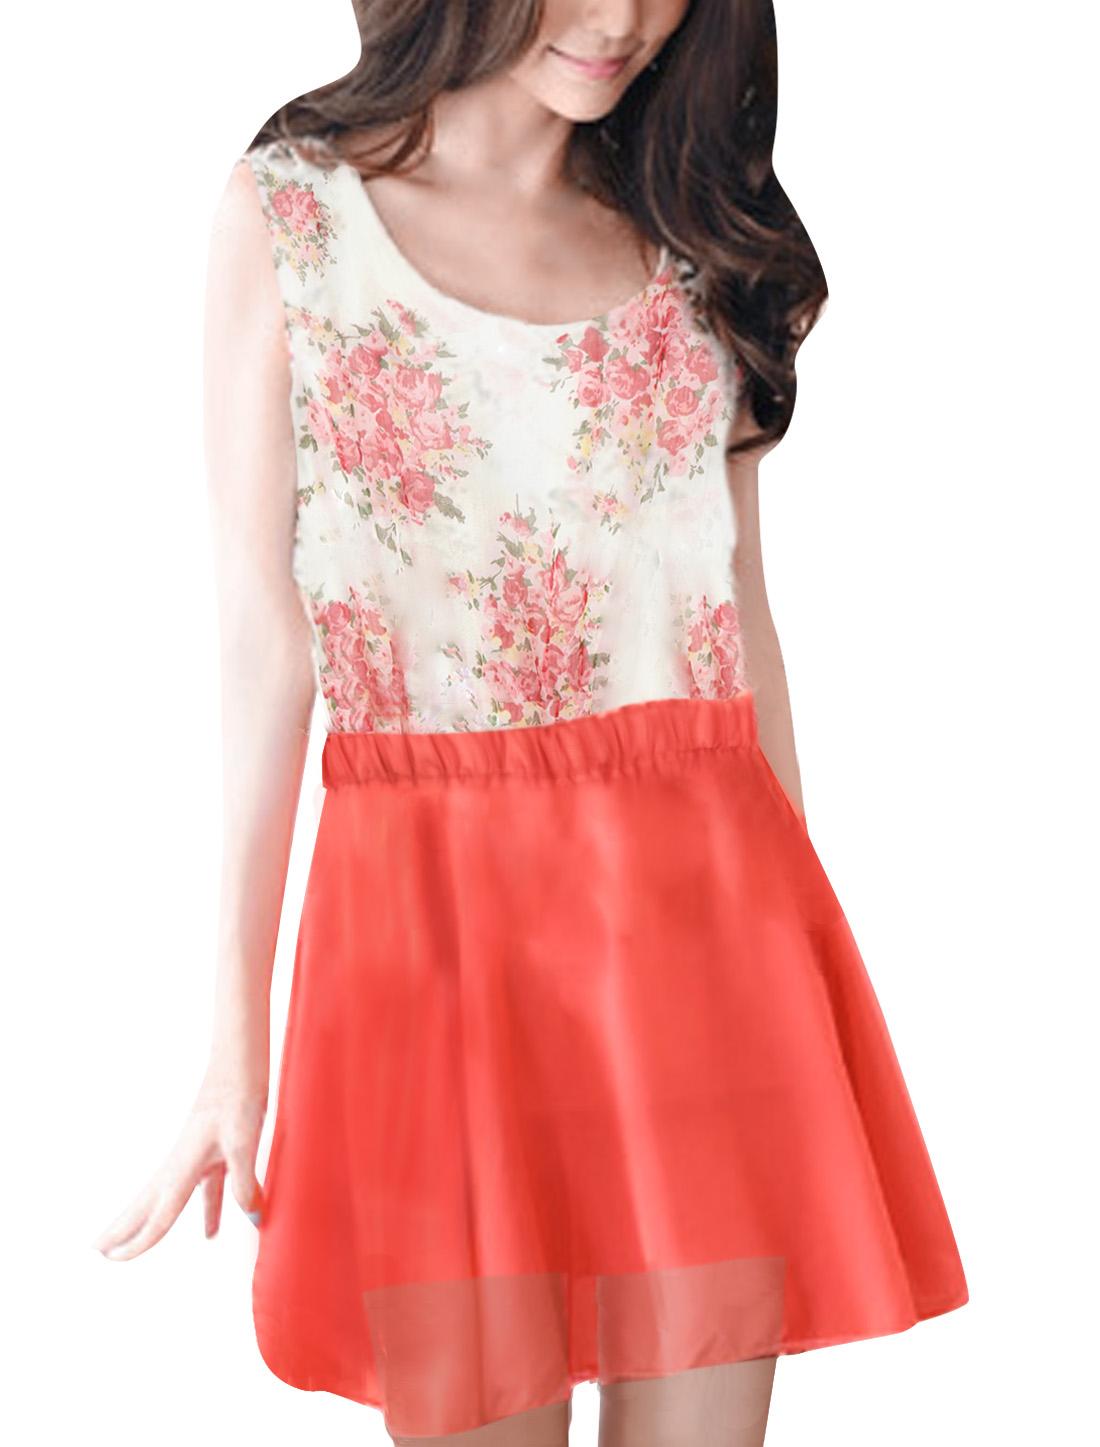 Flower Print Scoop Neck Sleeveless Elastic Waist Chiffon Dress XS for Women